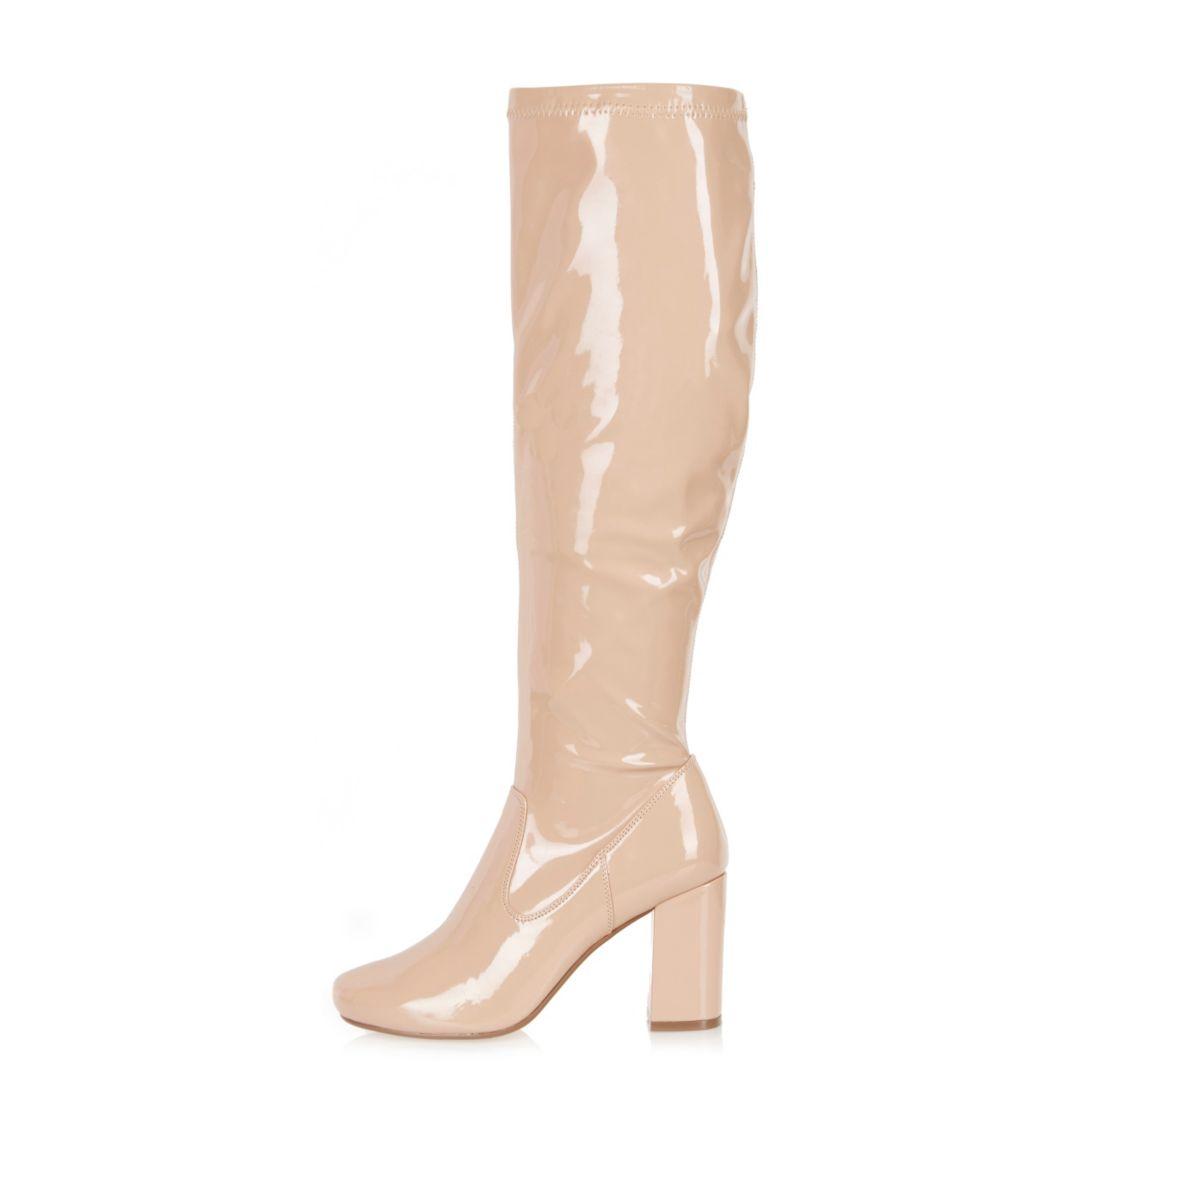 Light pink patent heeled knee high boots